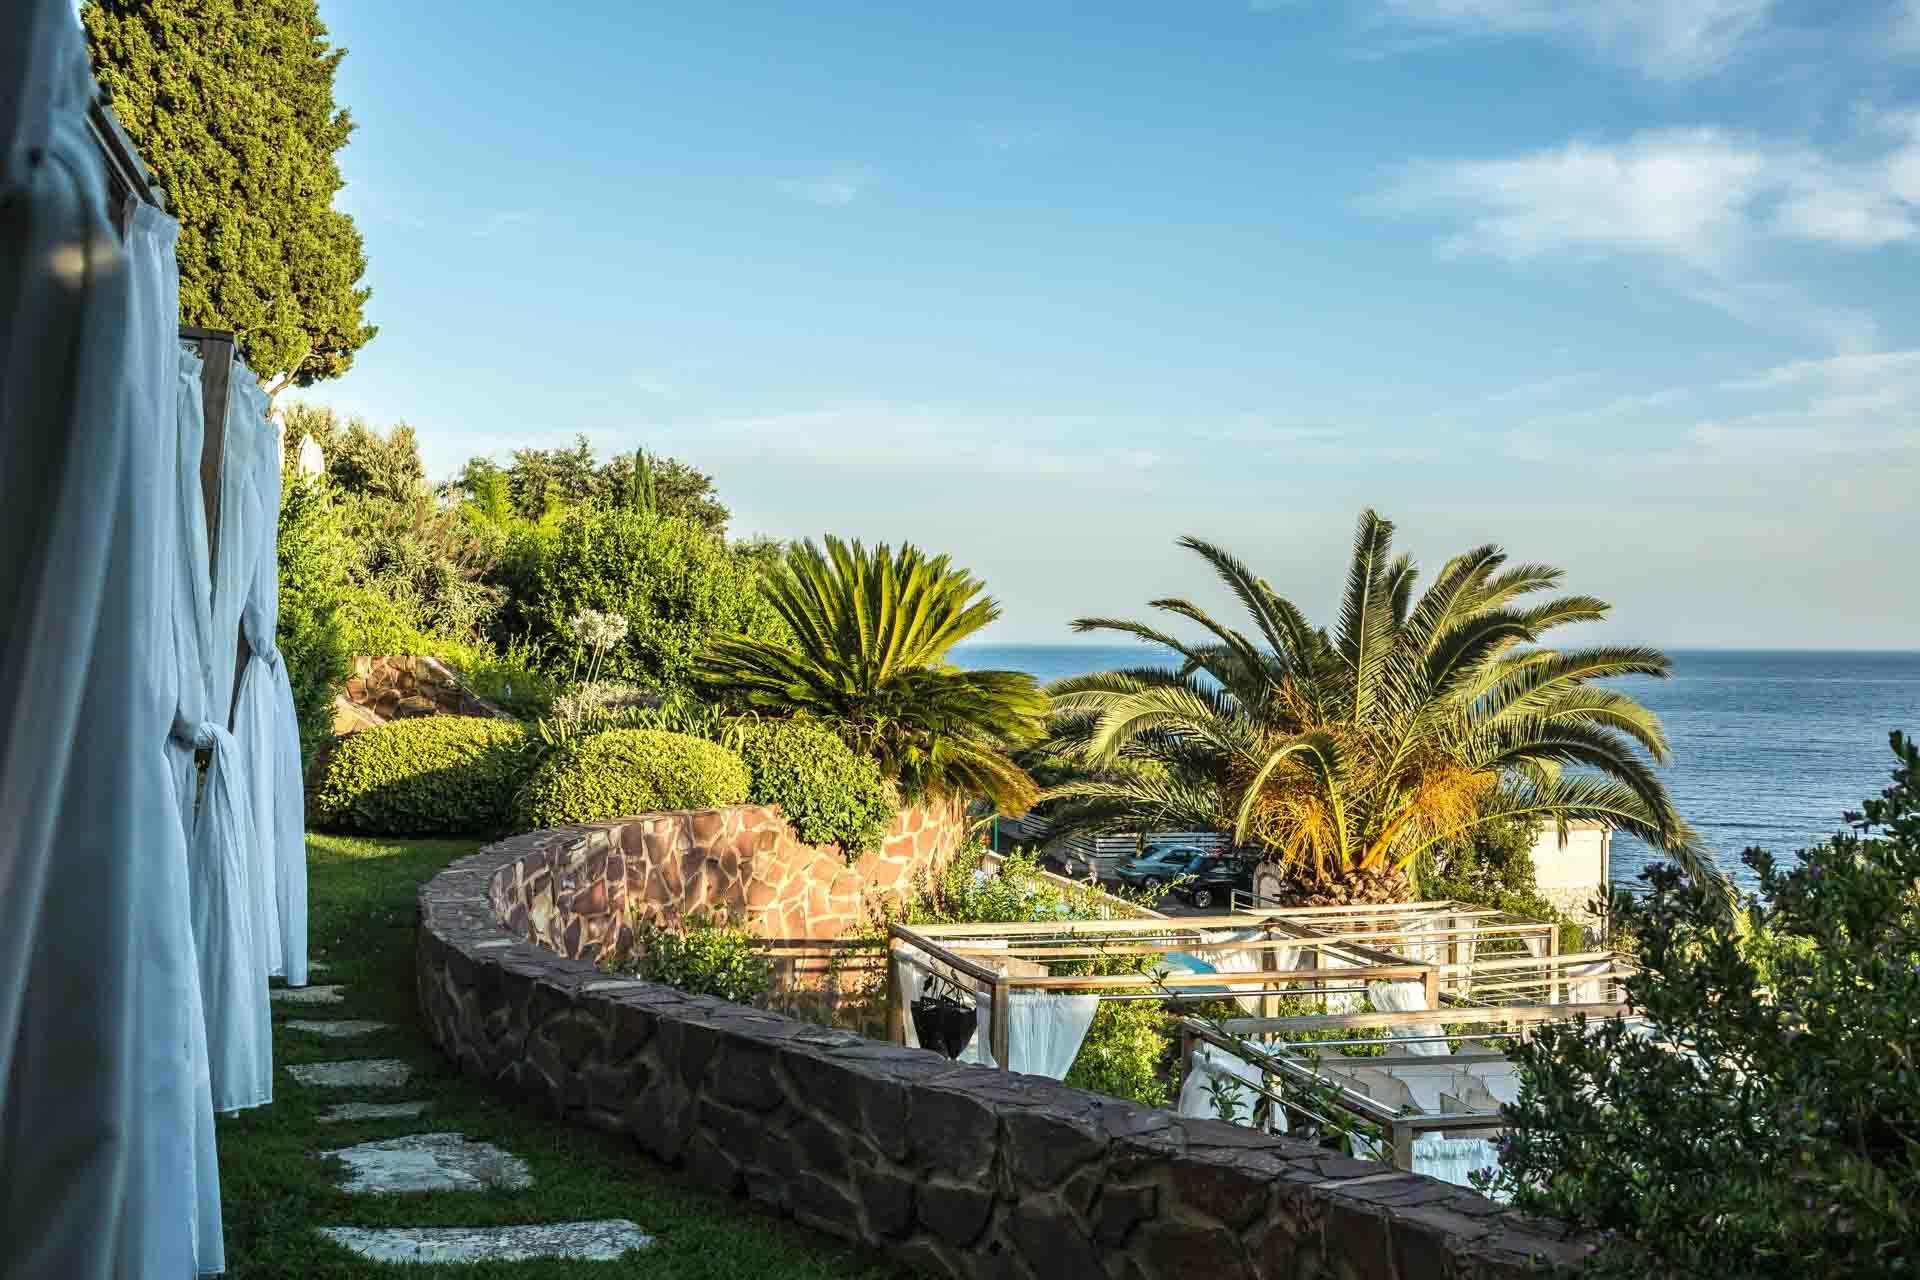 Les jardins en terrasse du Tiara Yaktsa descendent jusqu'à la piscine © Magali Ancenay Agency